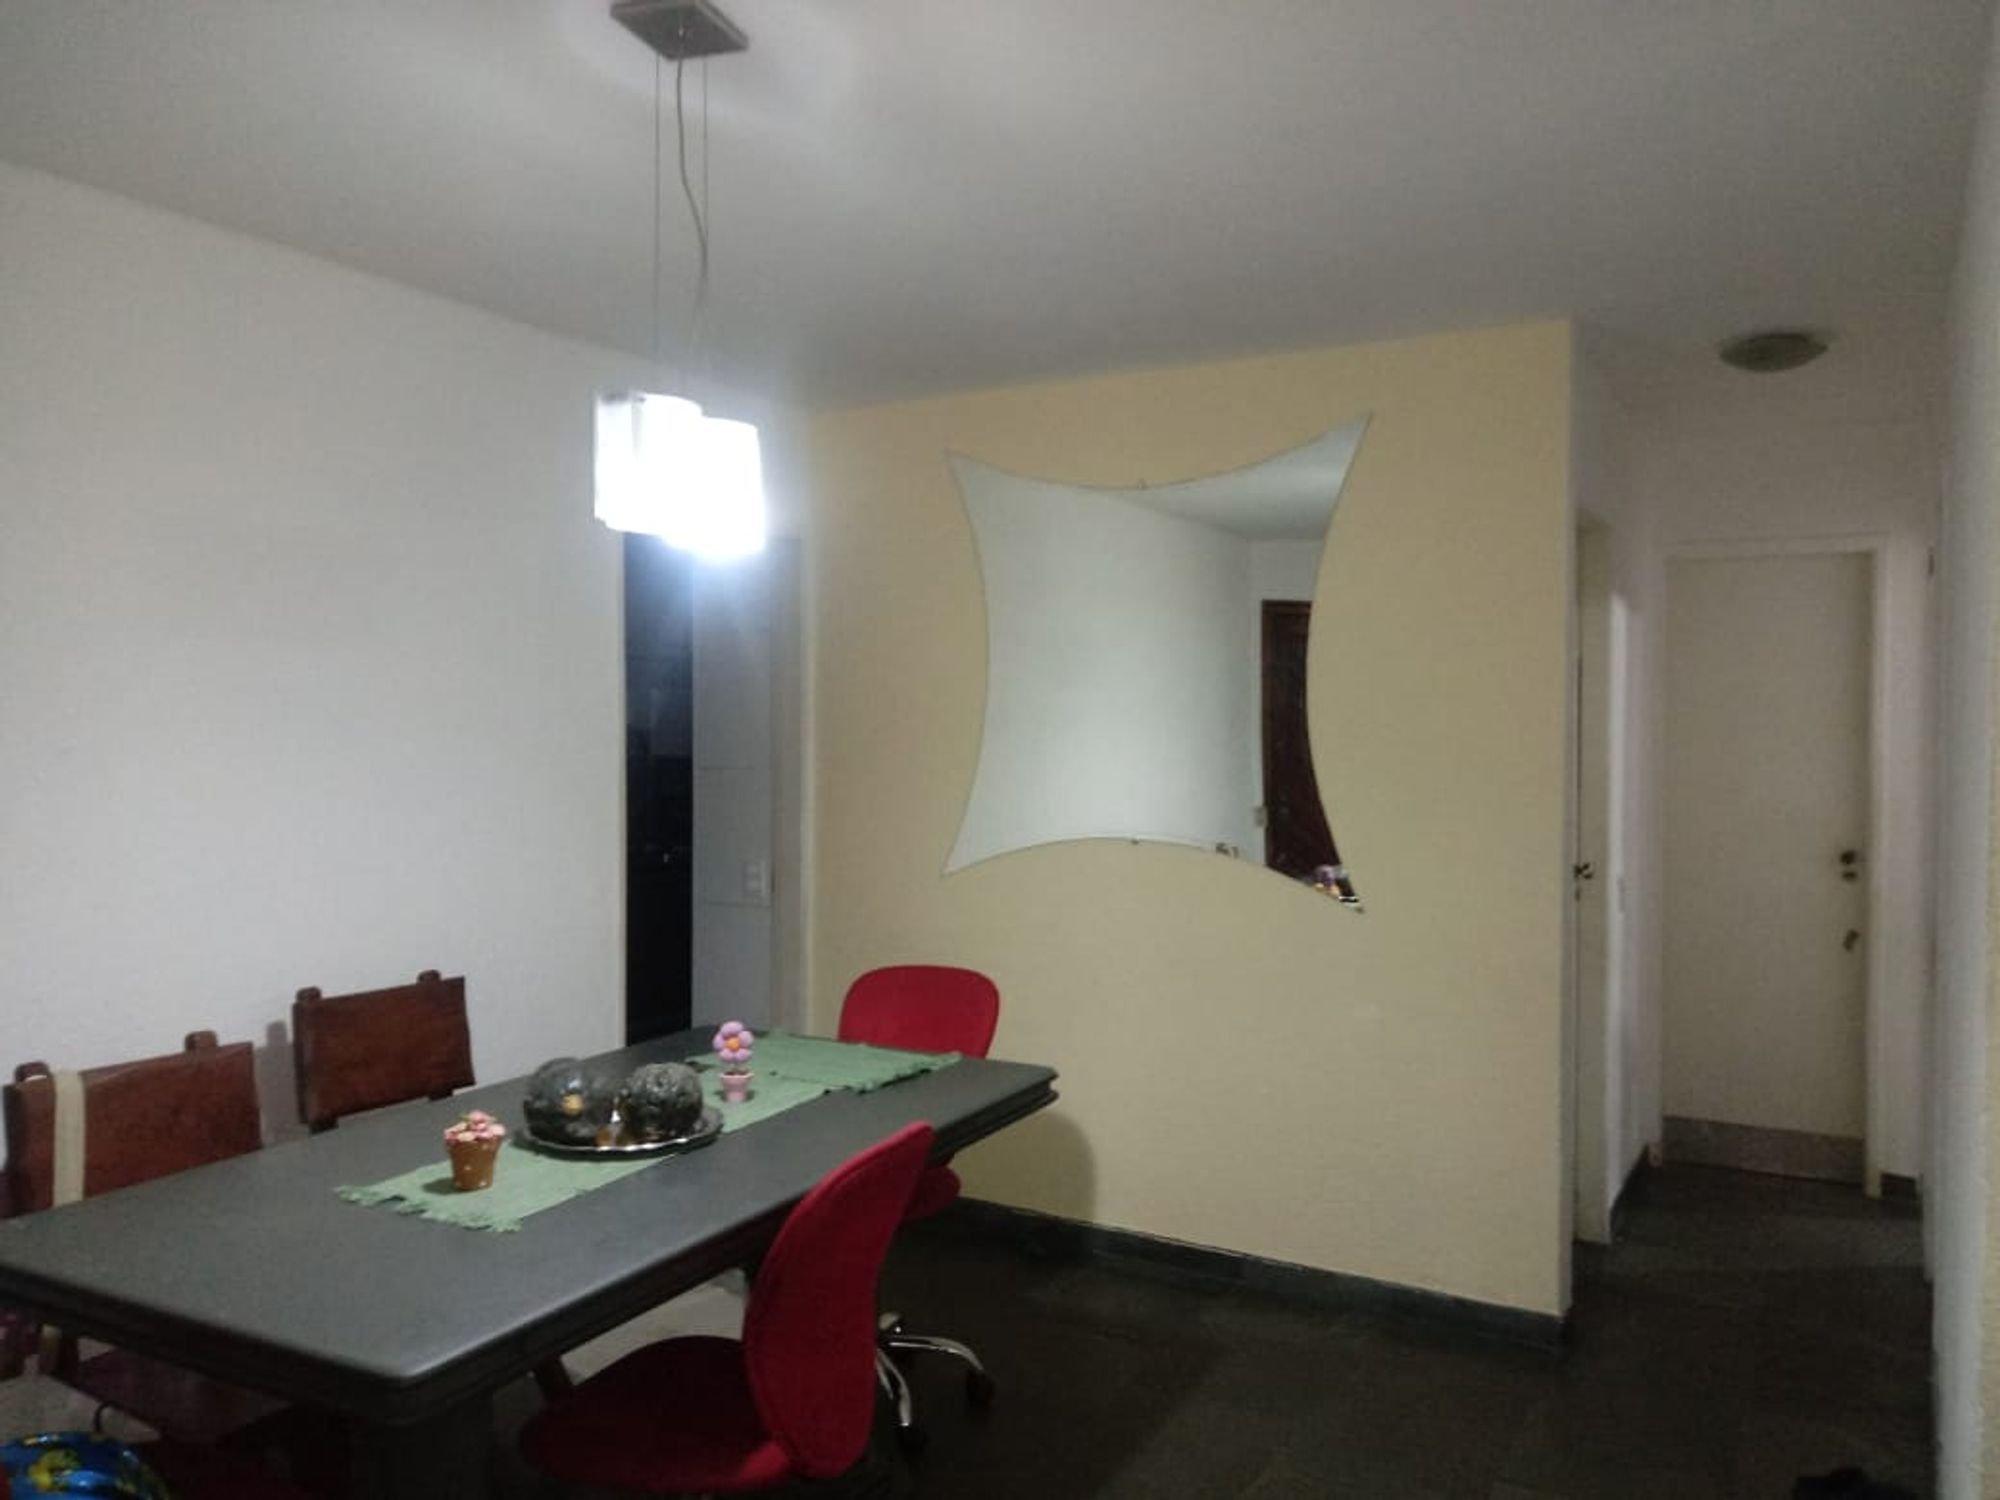 Foto de Sala com cadeira, mesa de jantar, xícara